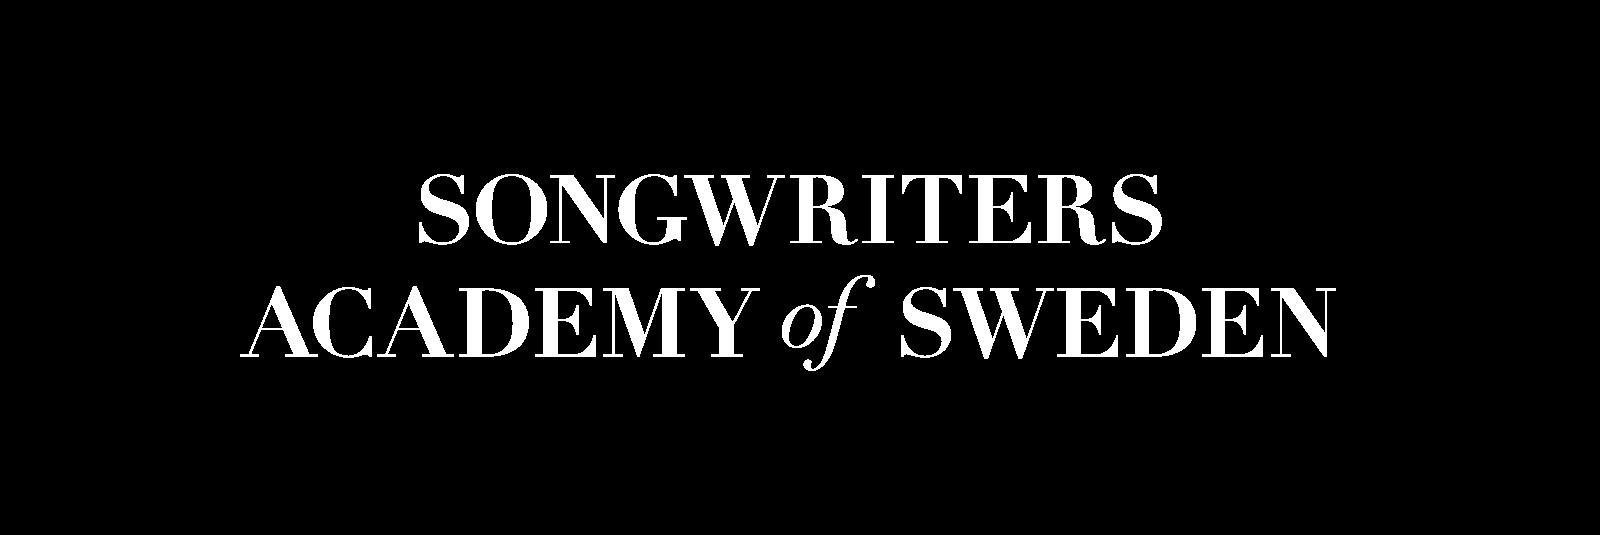 Songwriters Academy of Sweden